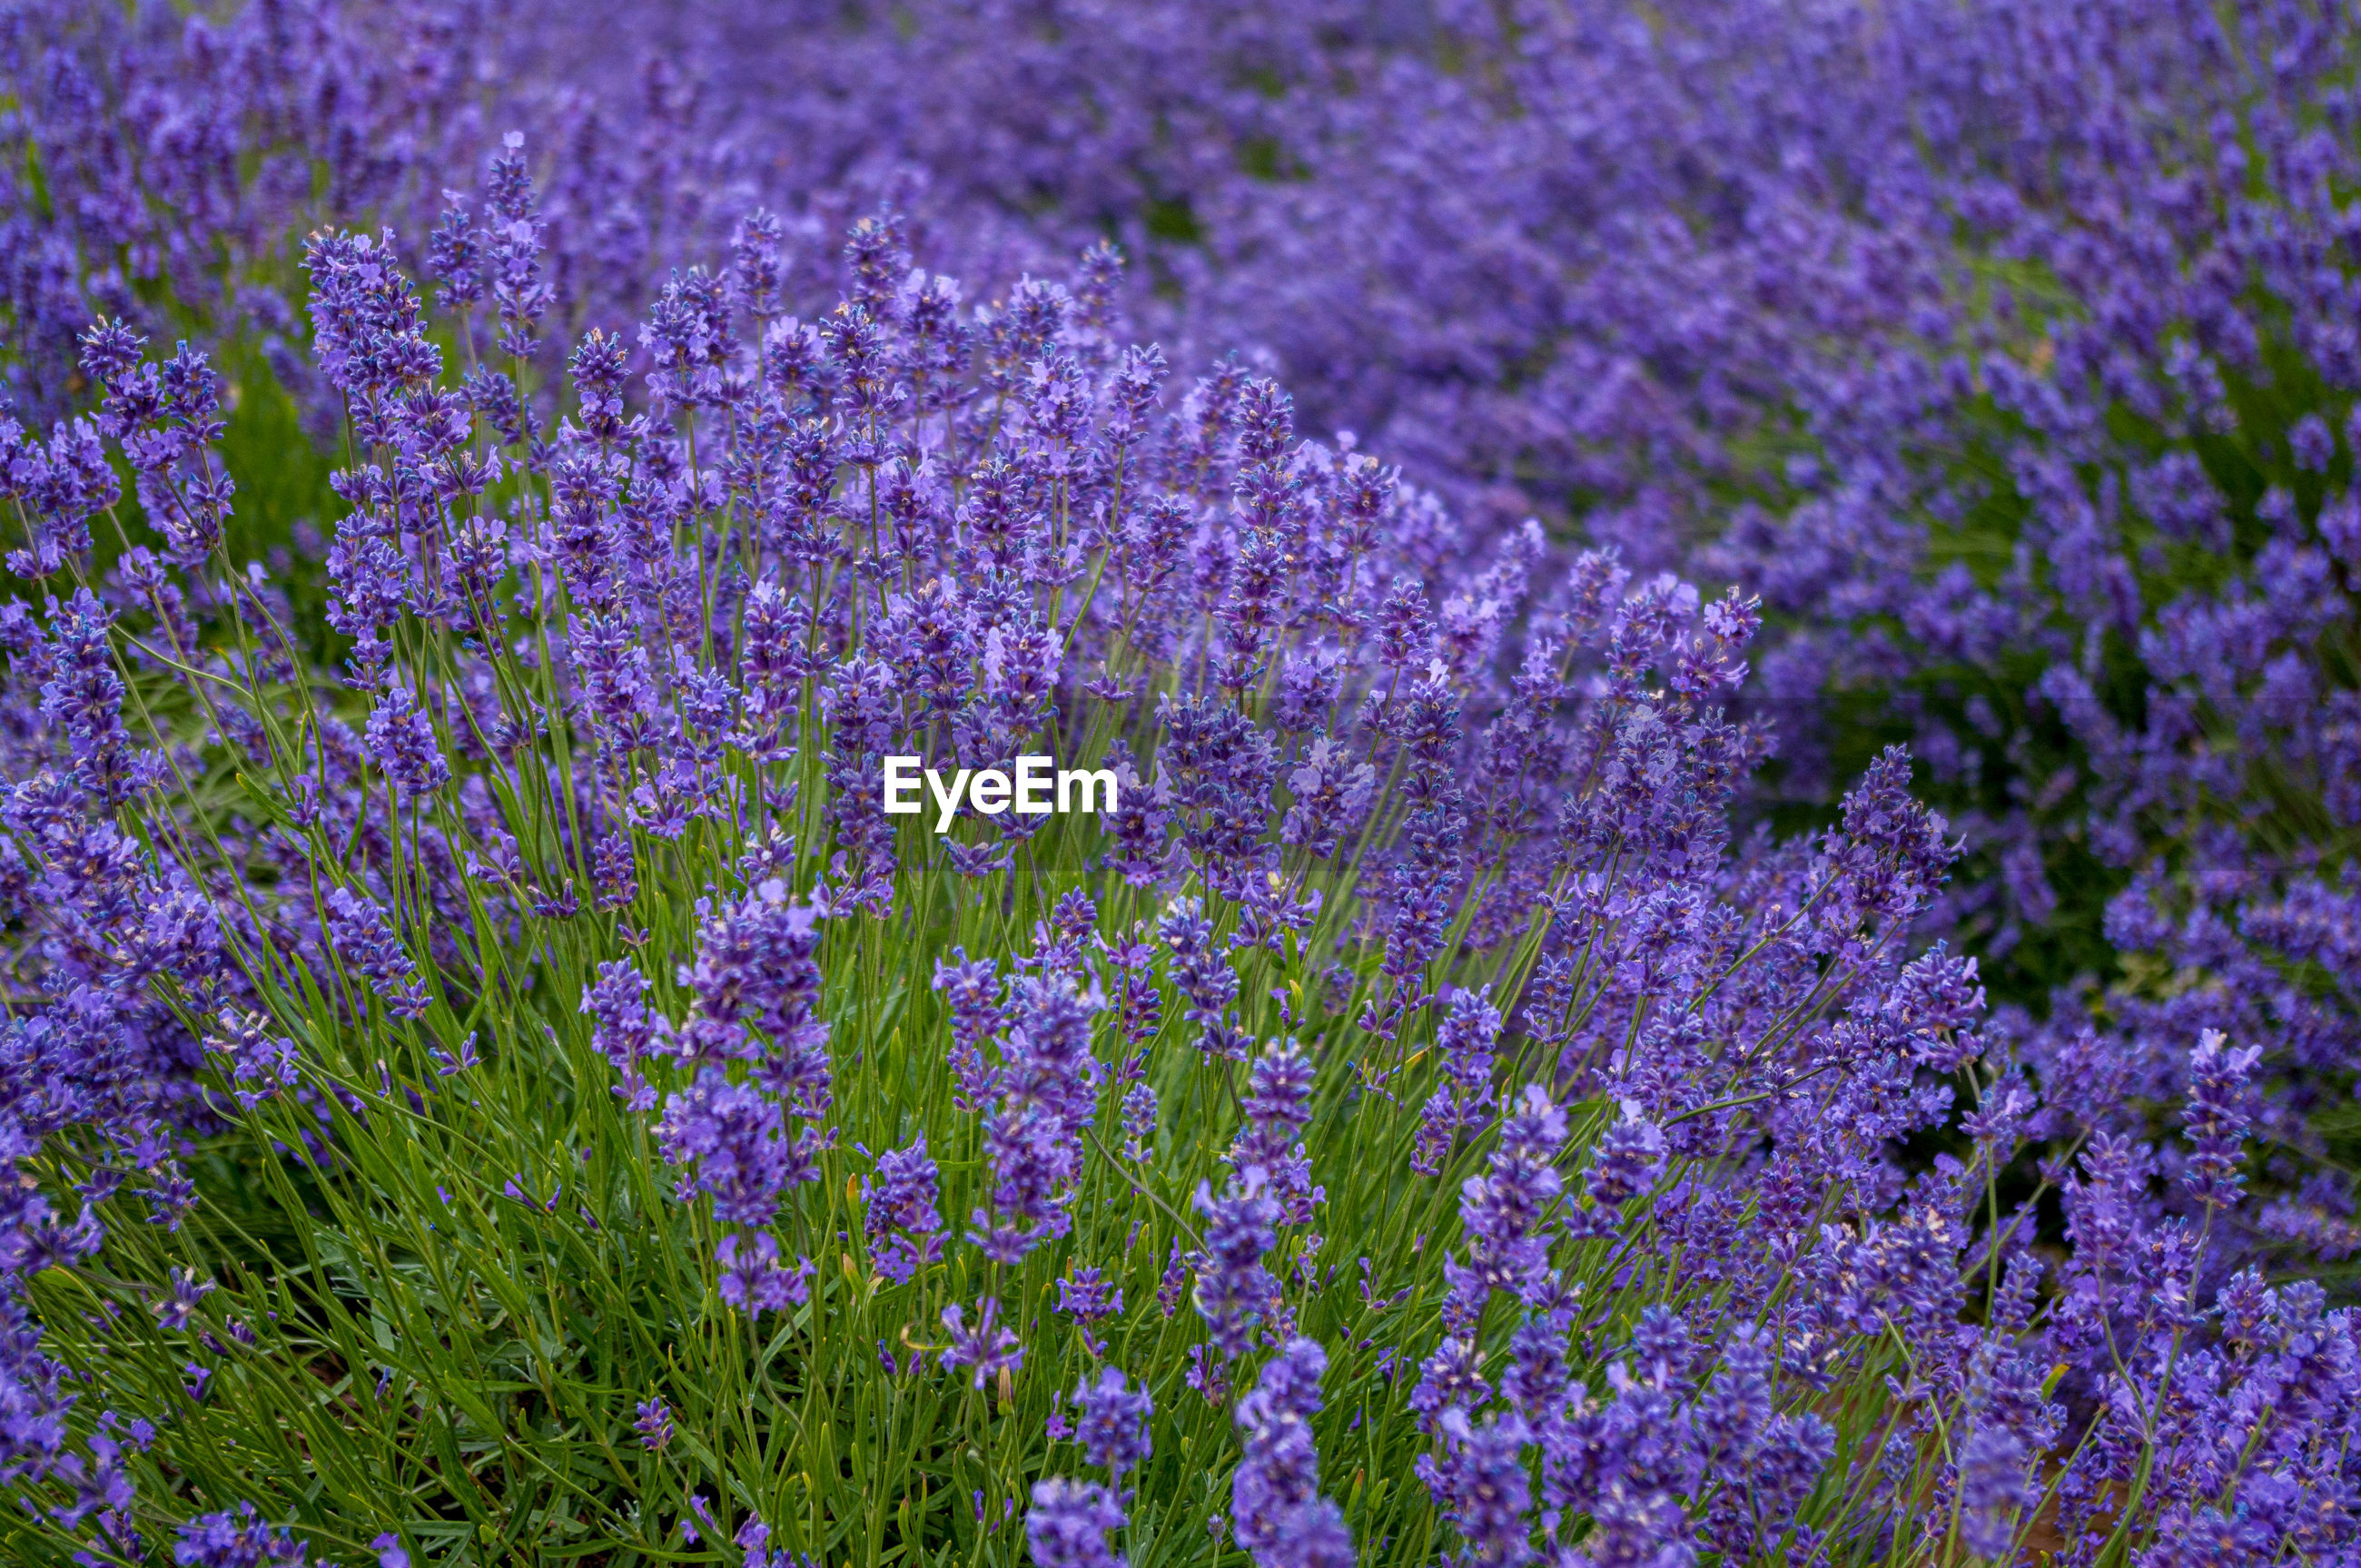 Lavender plants in flower in field ready for harvesting for lavender oil